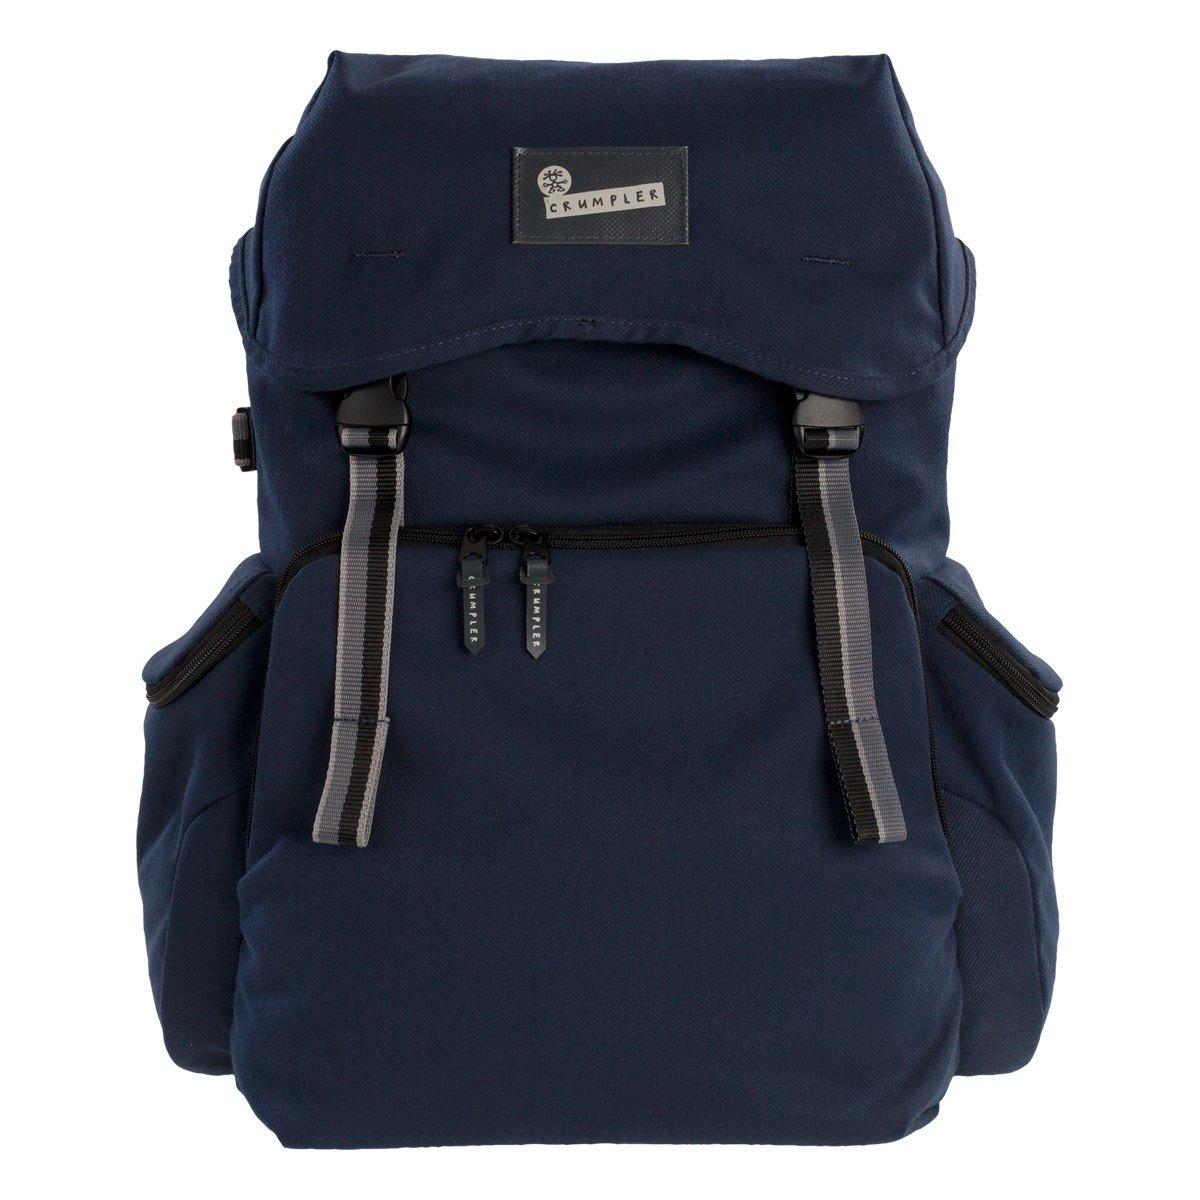 Crumpler Men's The Karachi Outpost Large Camera Backpack 31 Midnight Blue